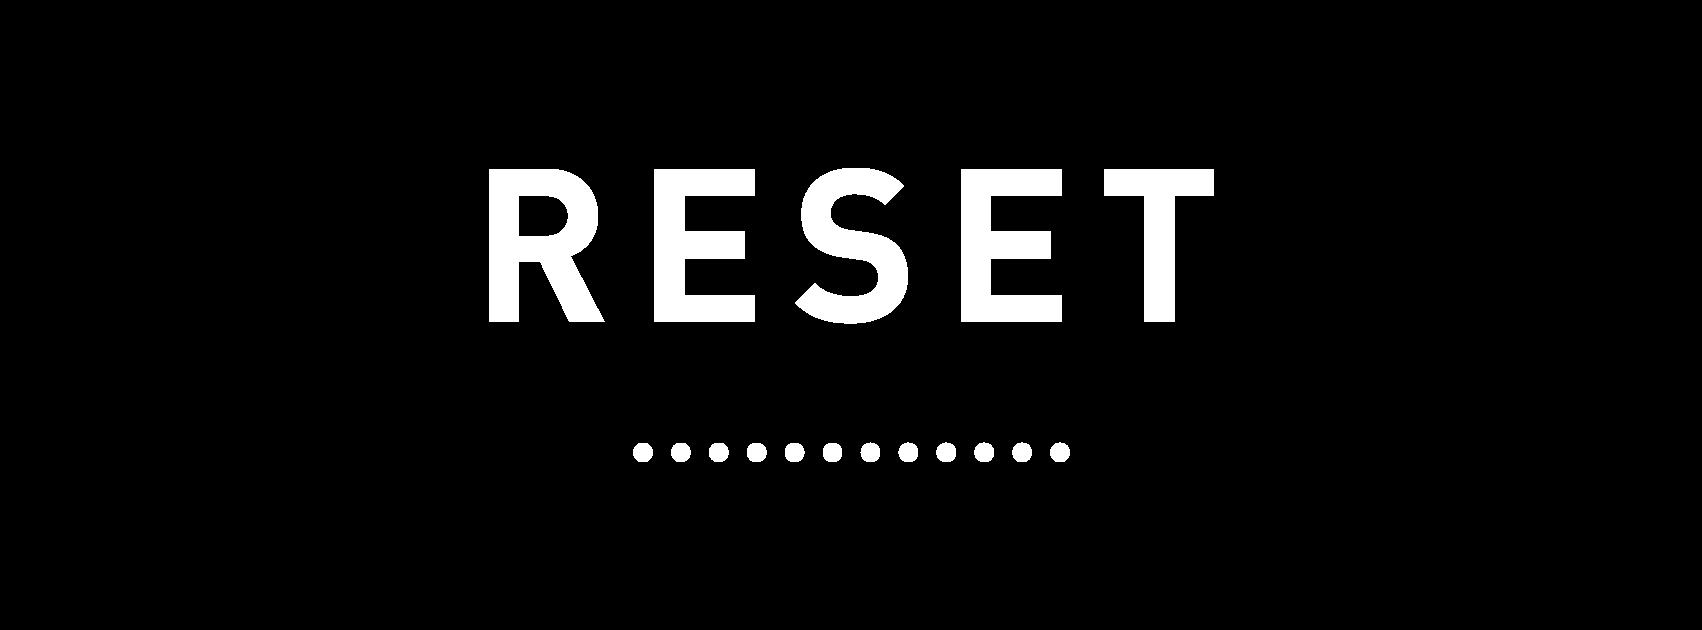 resetlogo.png